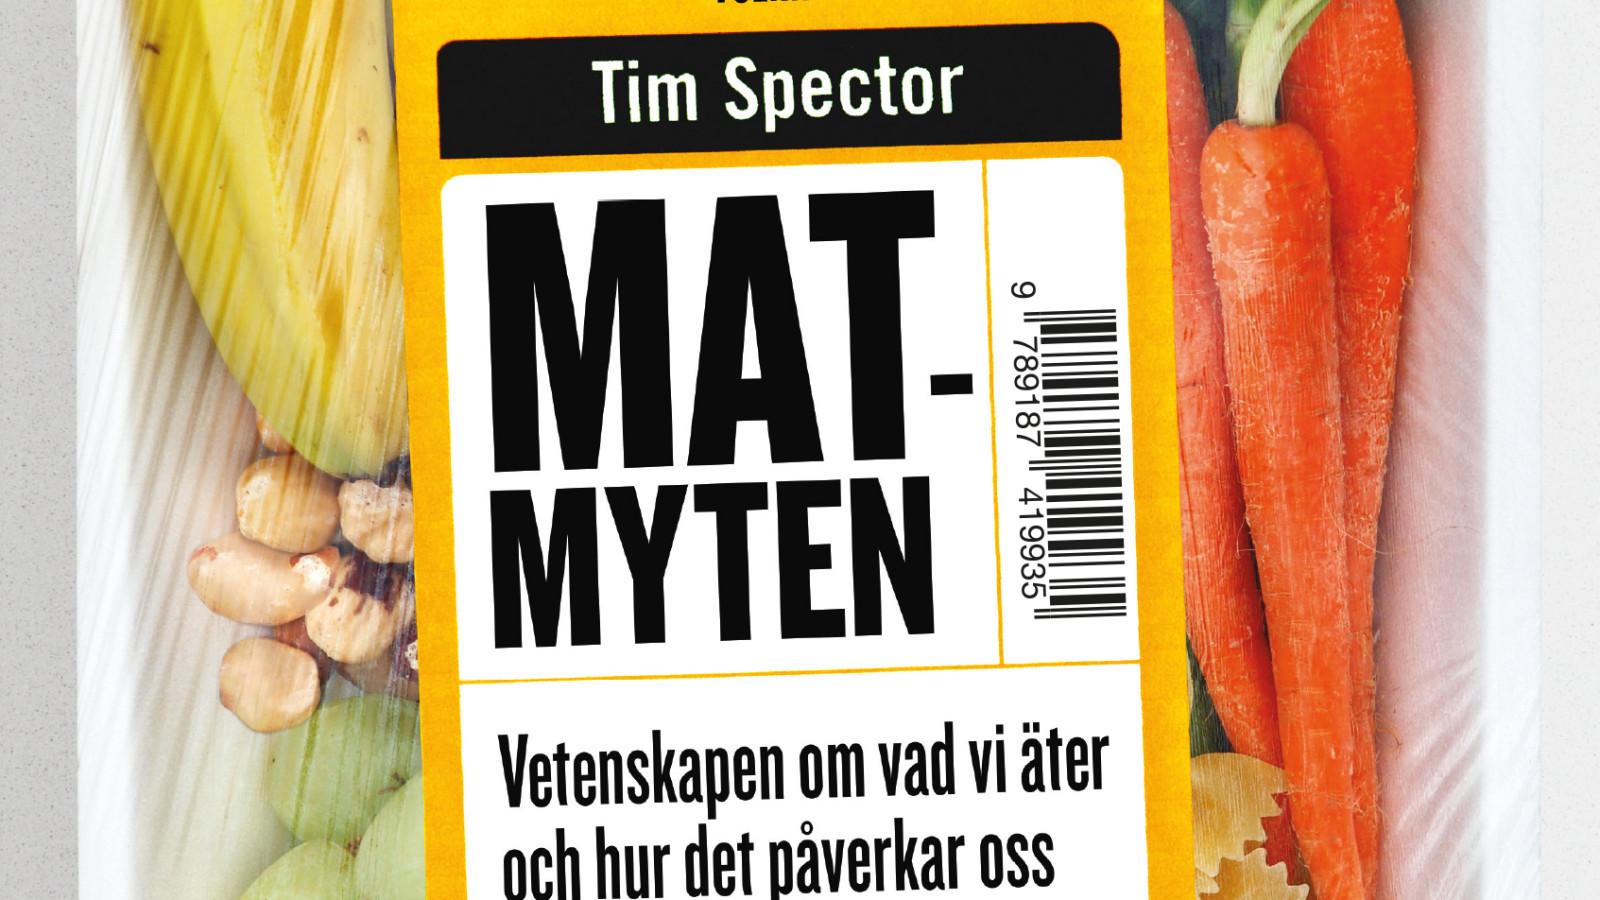 O_Spector Matmyten_danskt band.indd